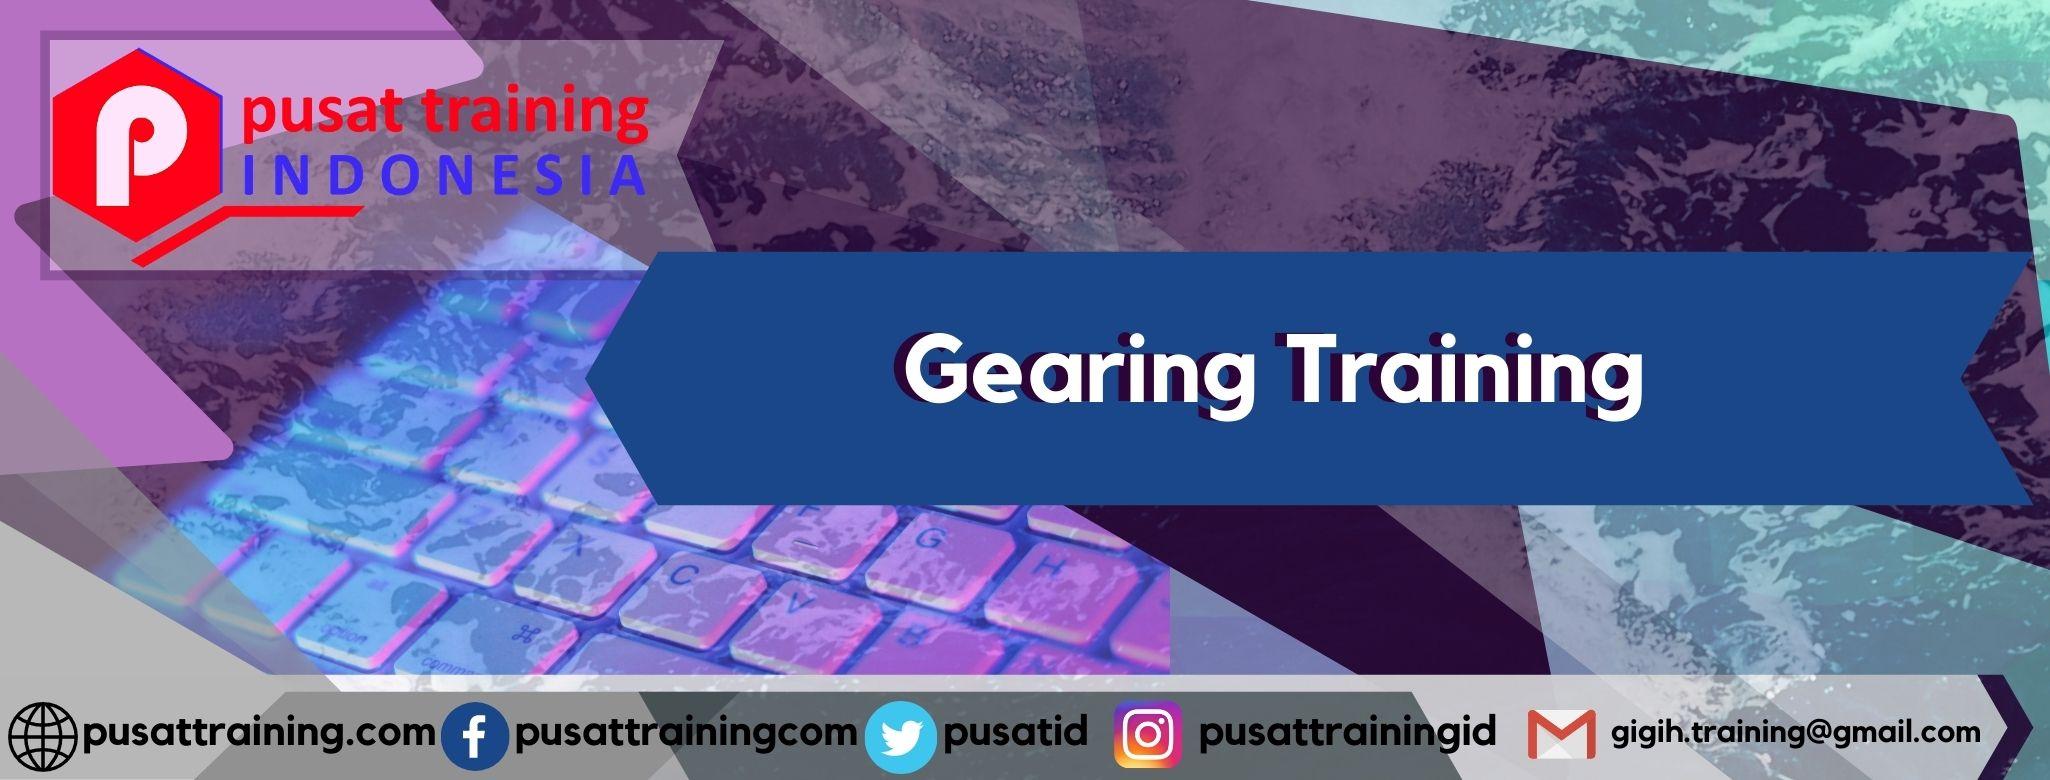 Gearing Training